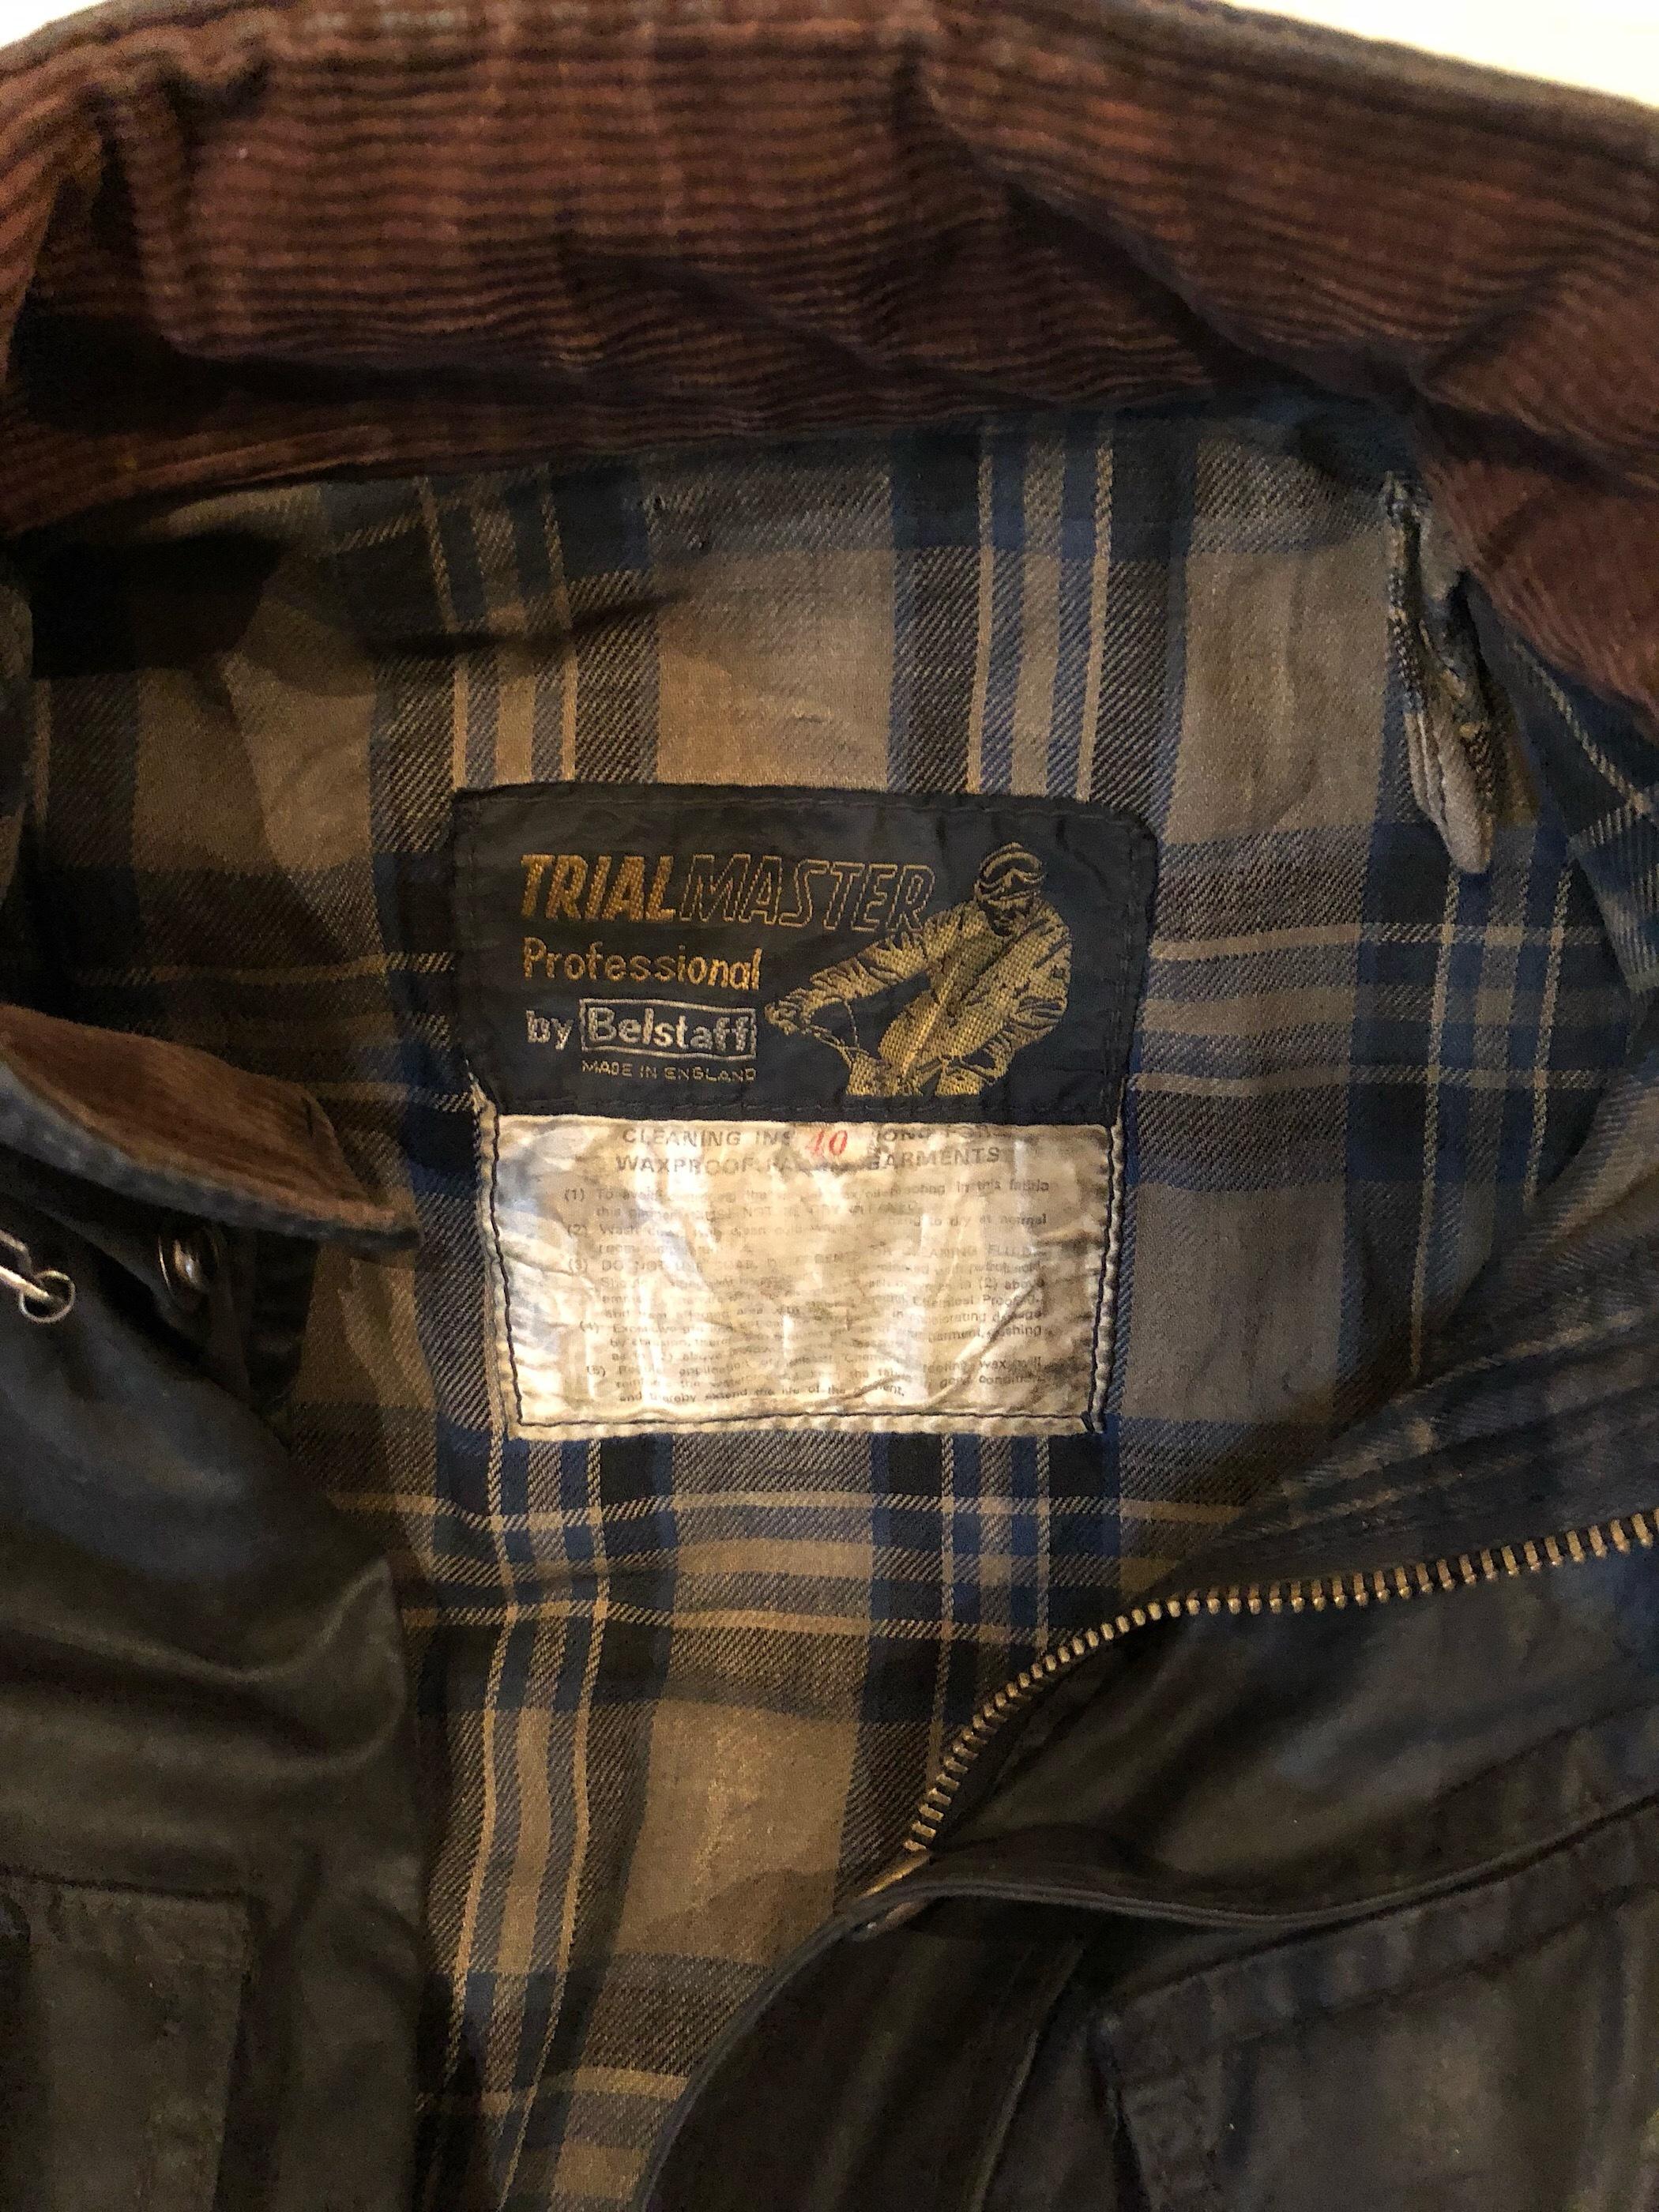 1960s Belstaff TRIAL MASTER waxed jacket